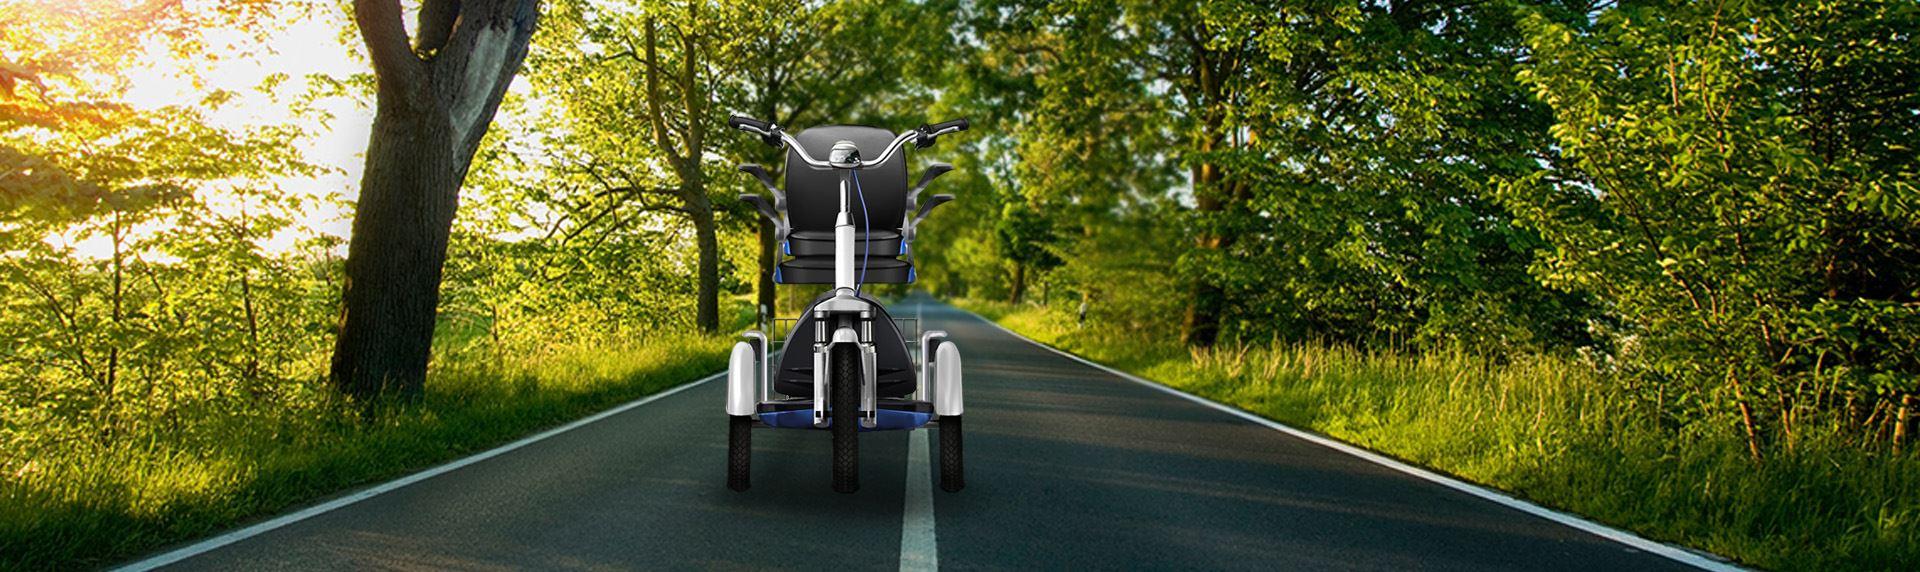 CMM新闻-老人代步车